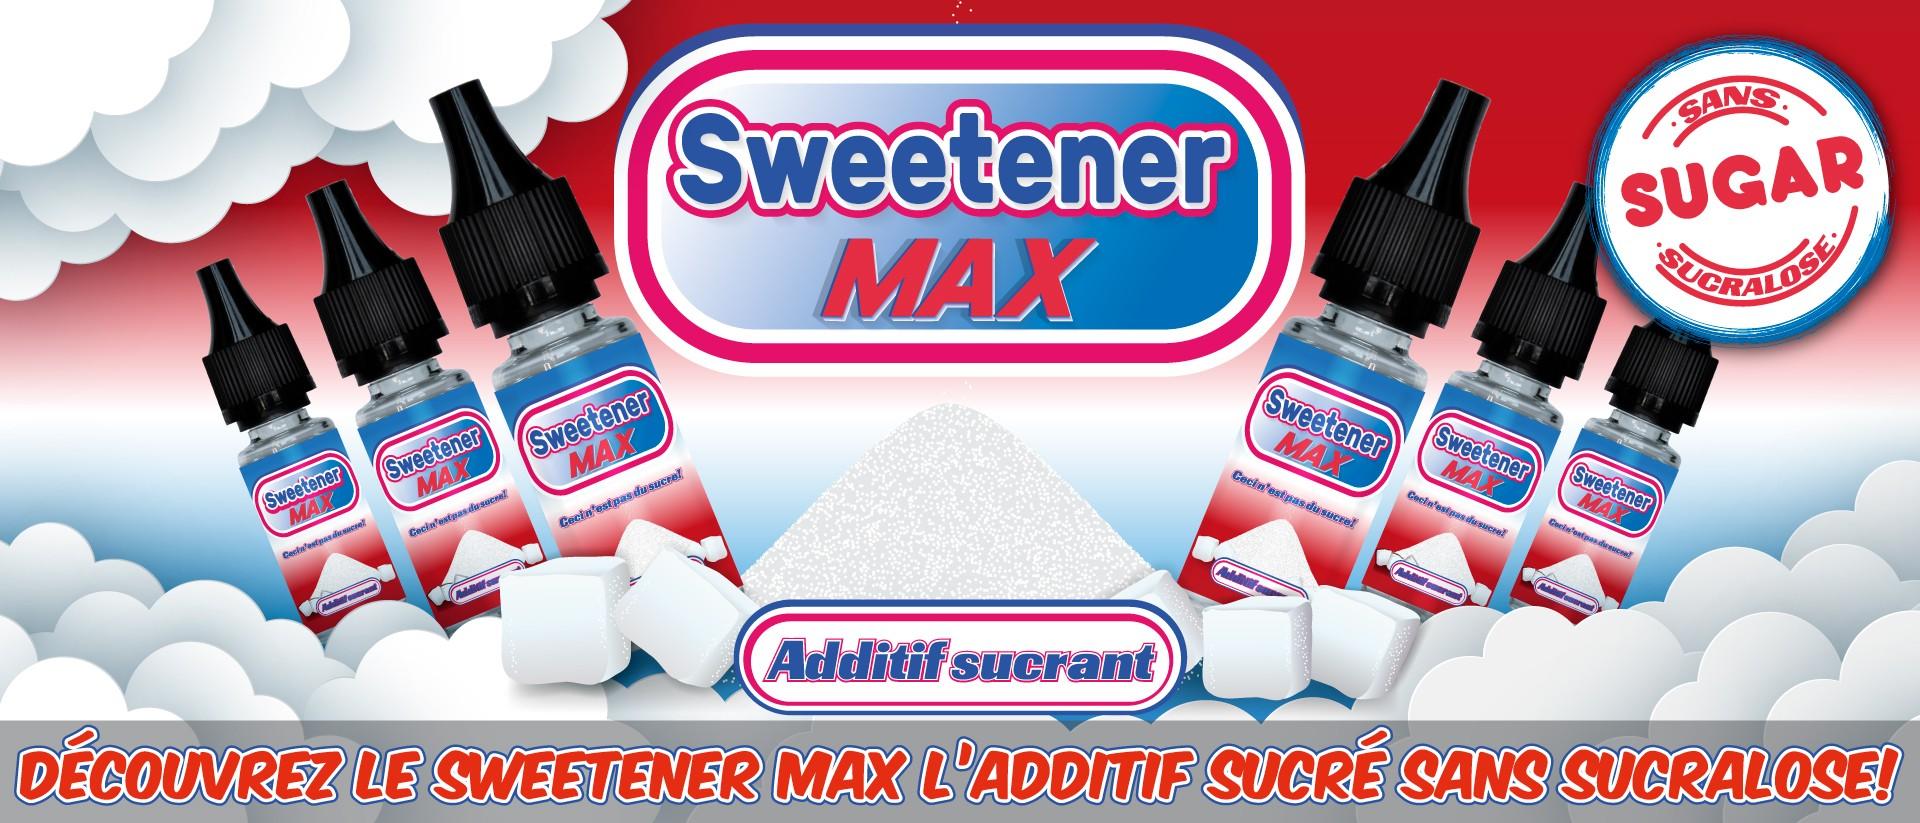 Sweetener Max